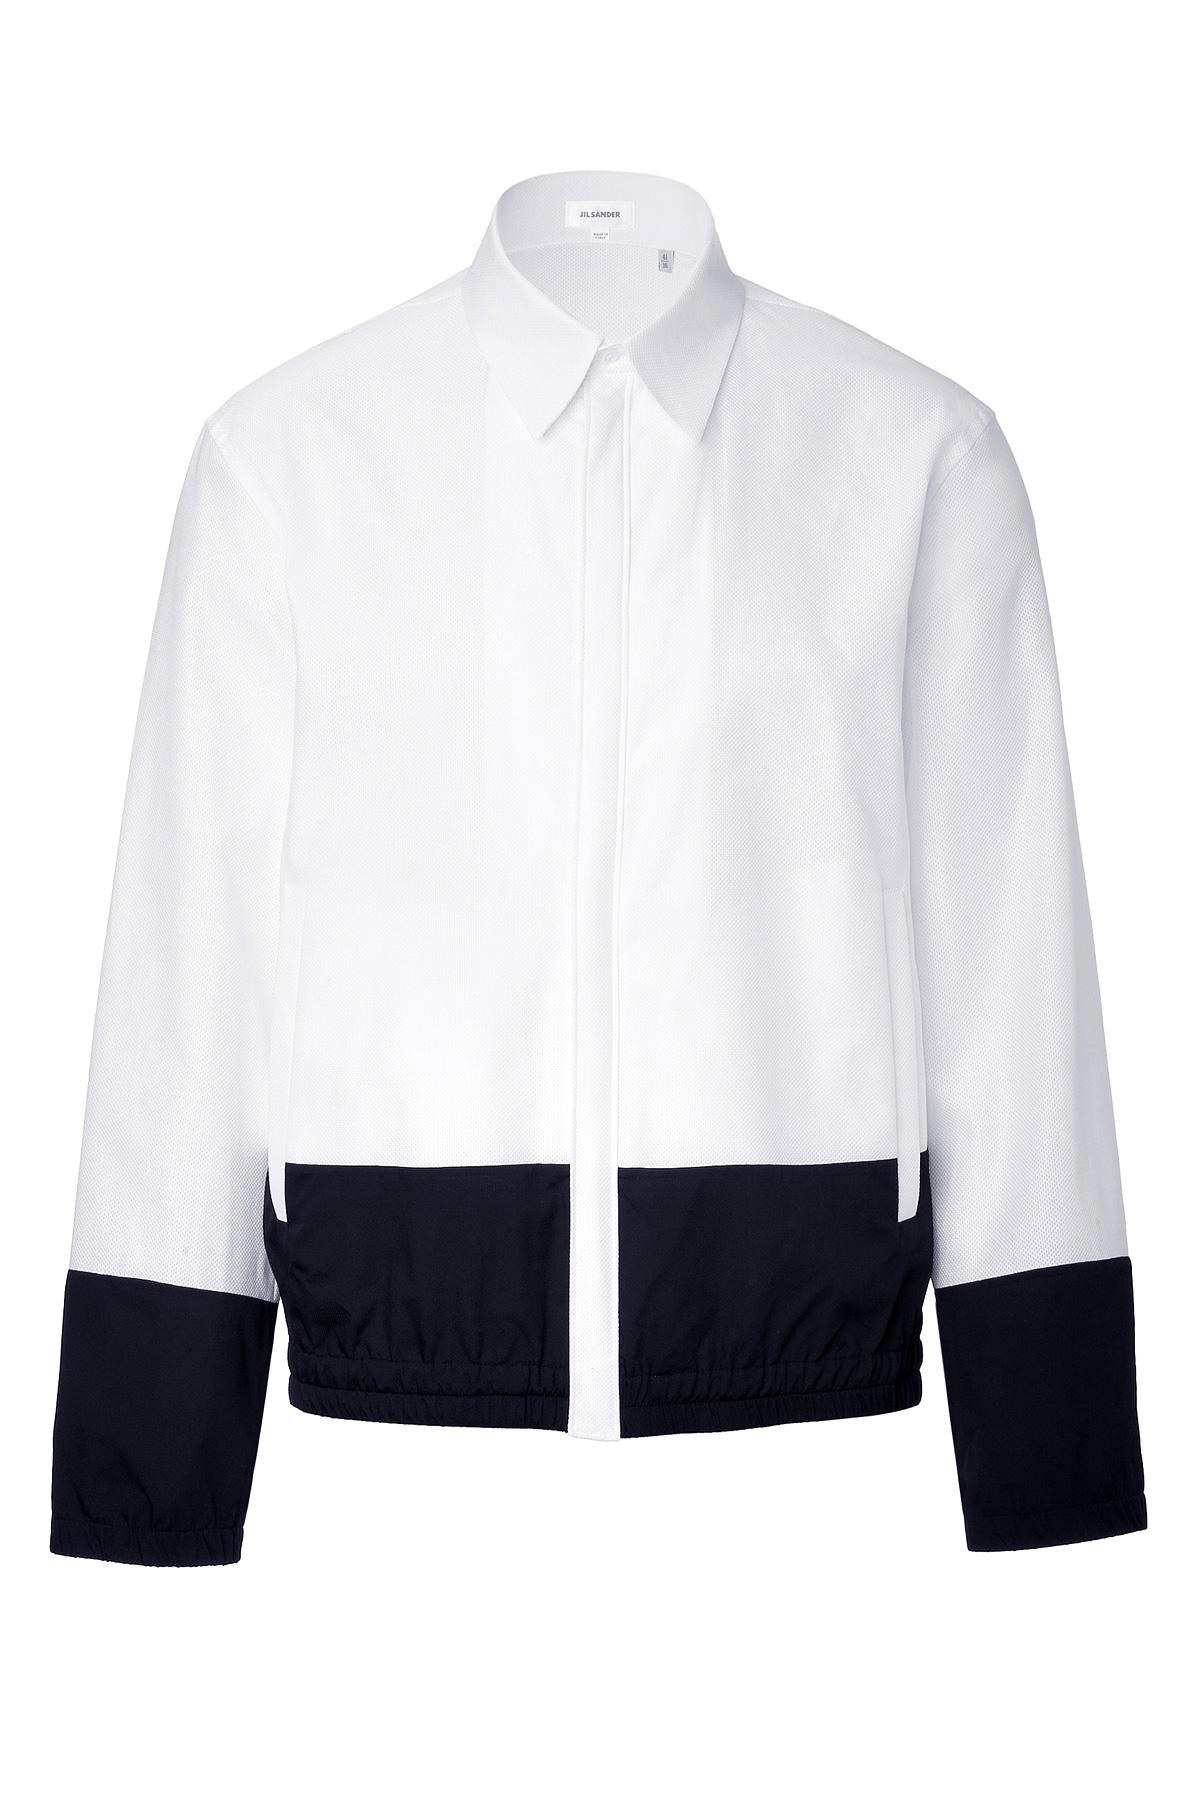 Lyst jil sander cotton cometa shirt jacket white in for Jil sander mens shirt